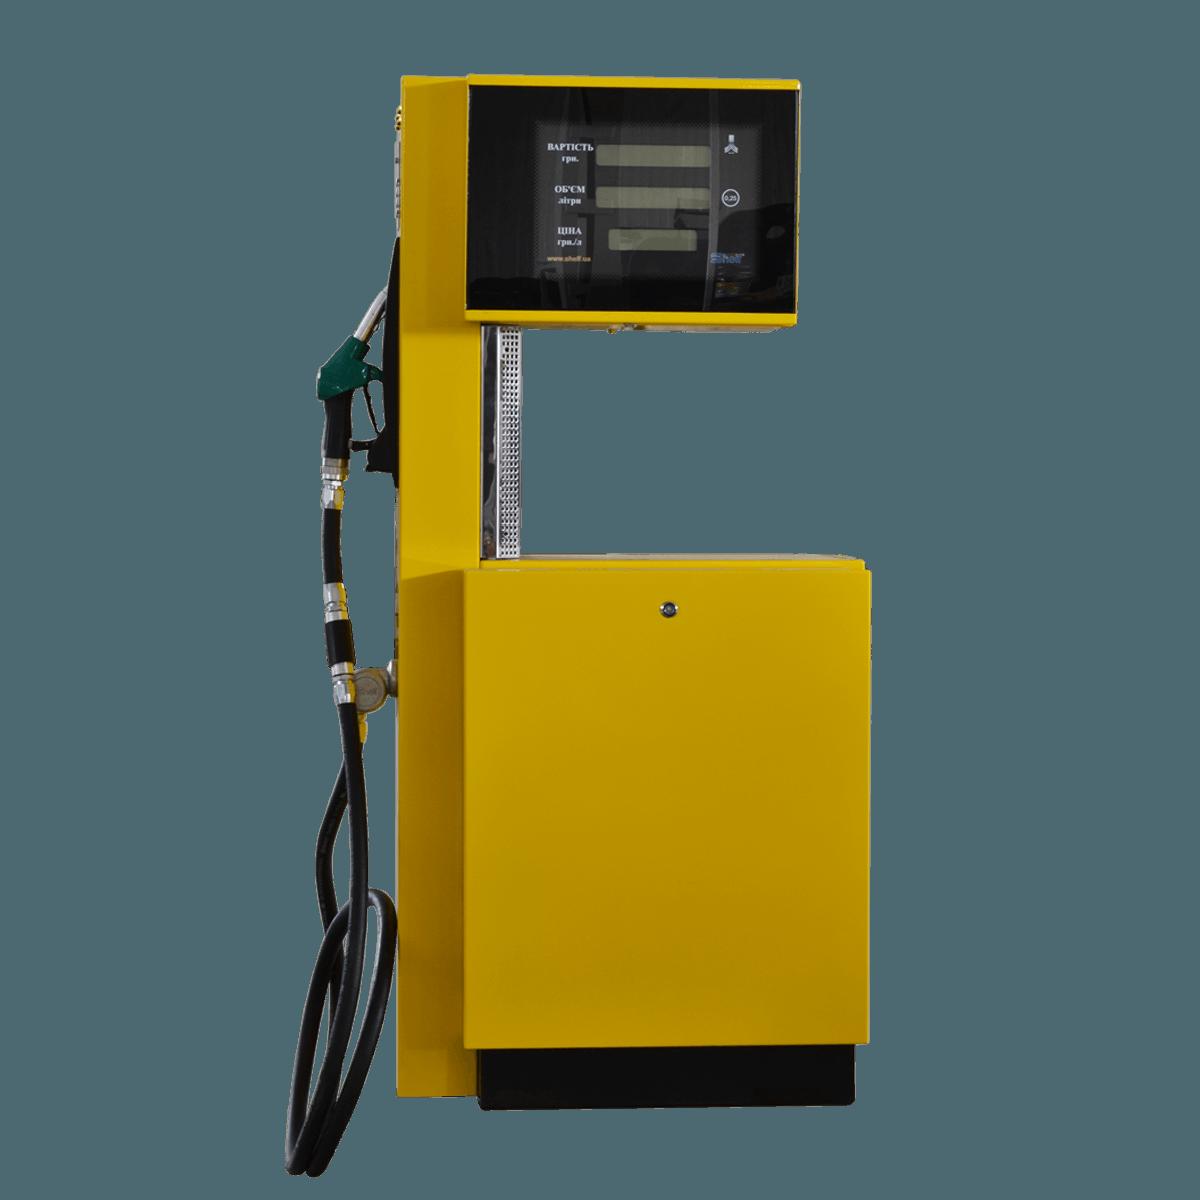 ПРК Шельф 100-1 - колонка для одного виду палива